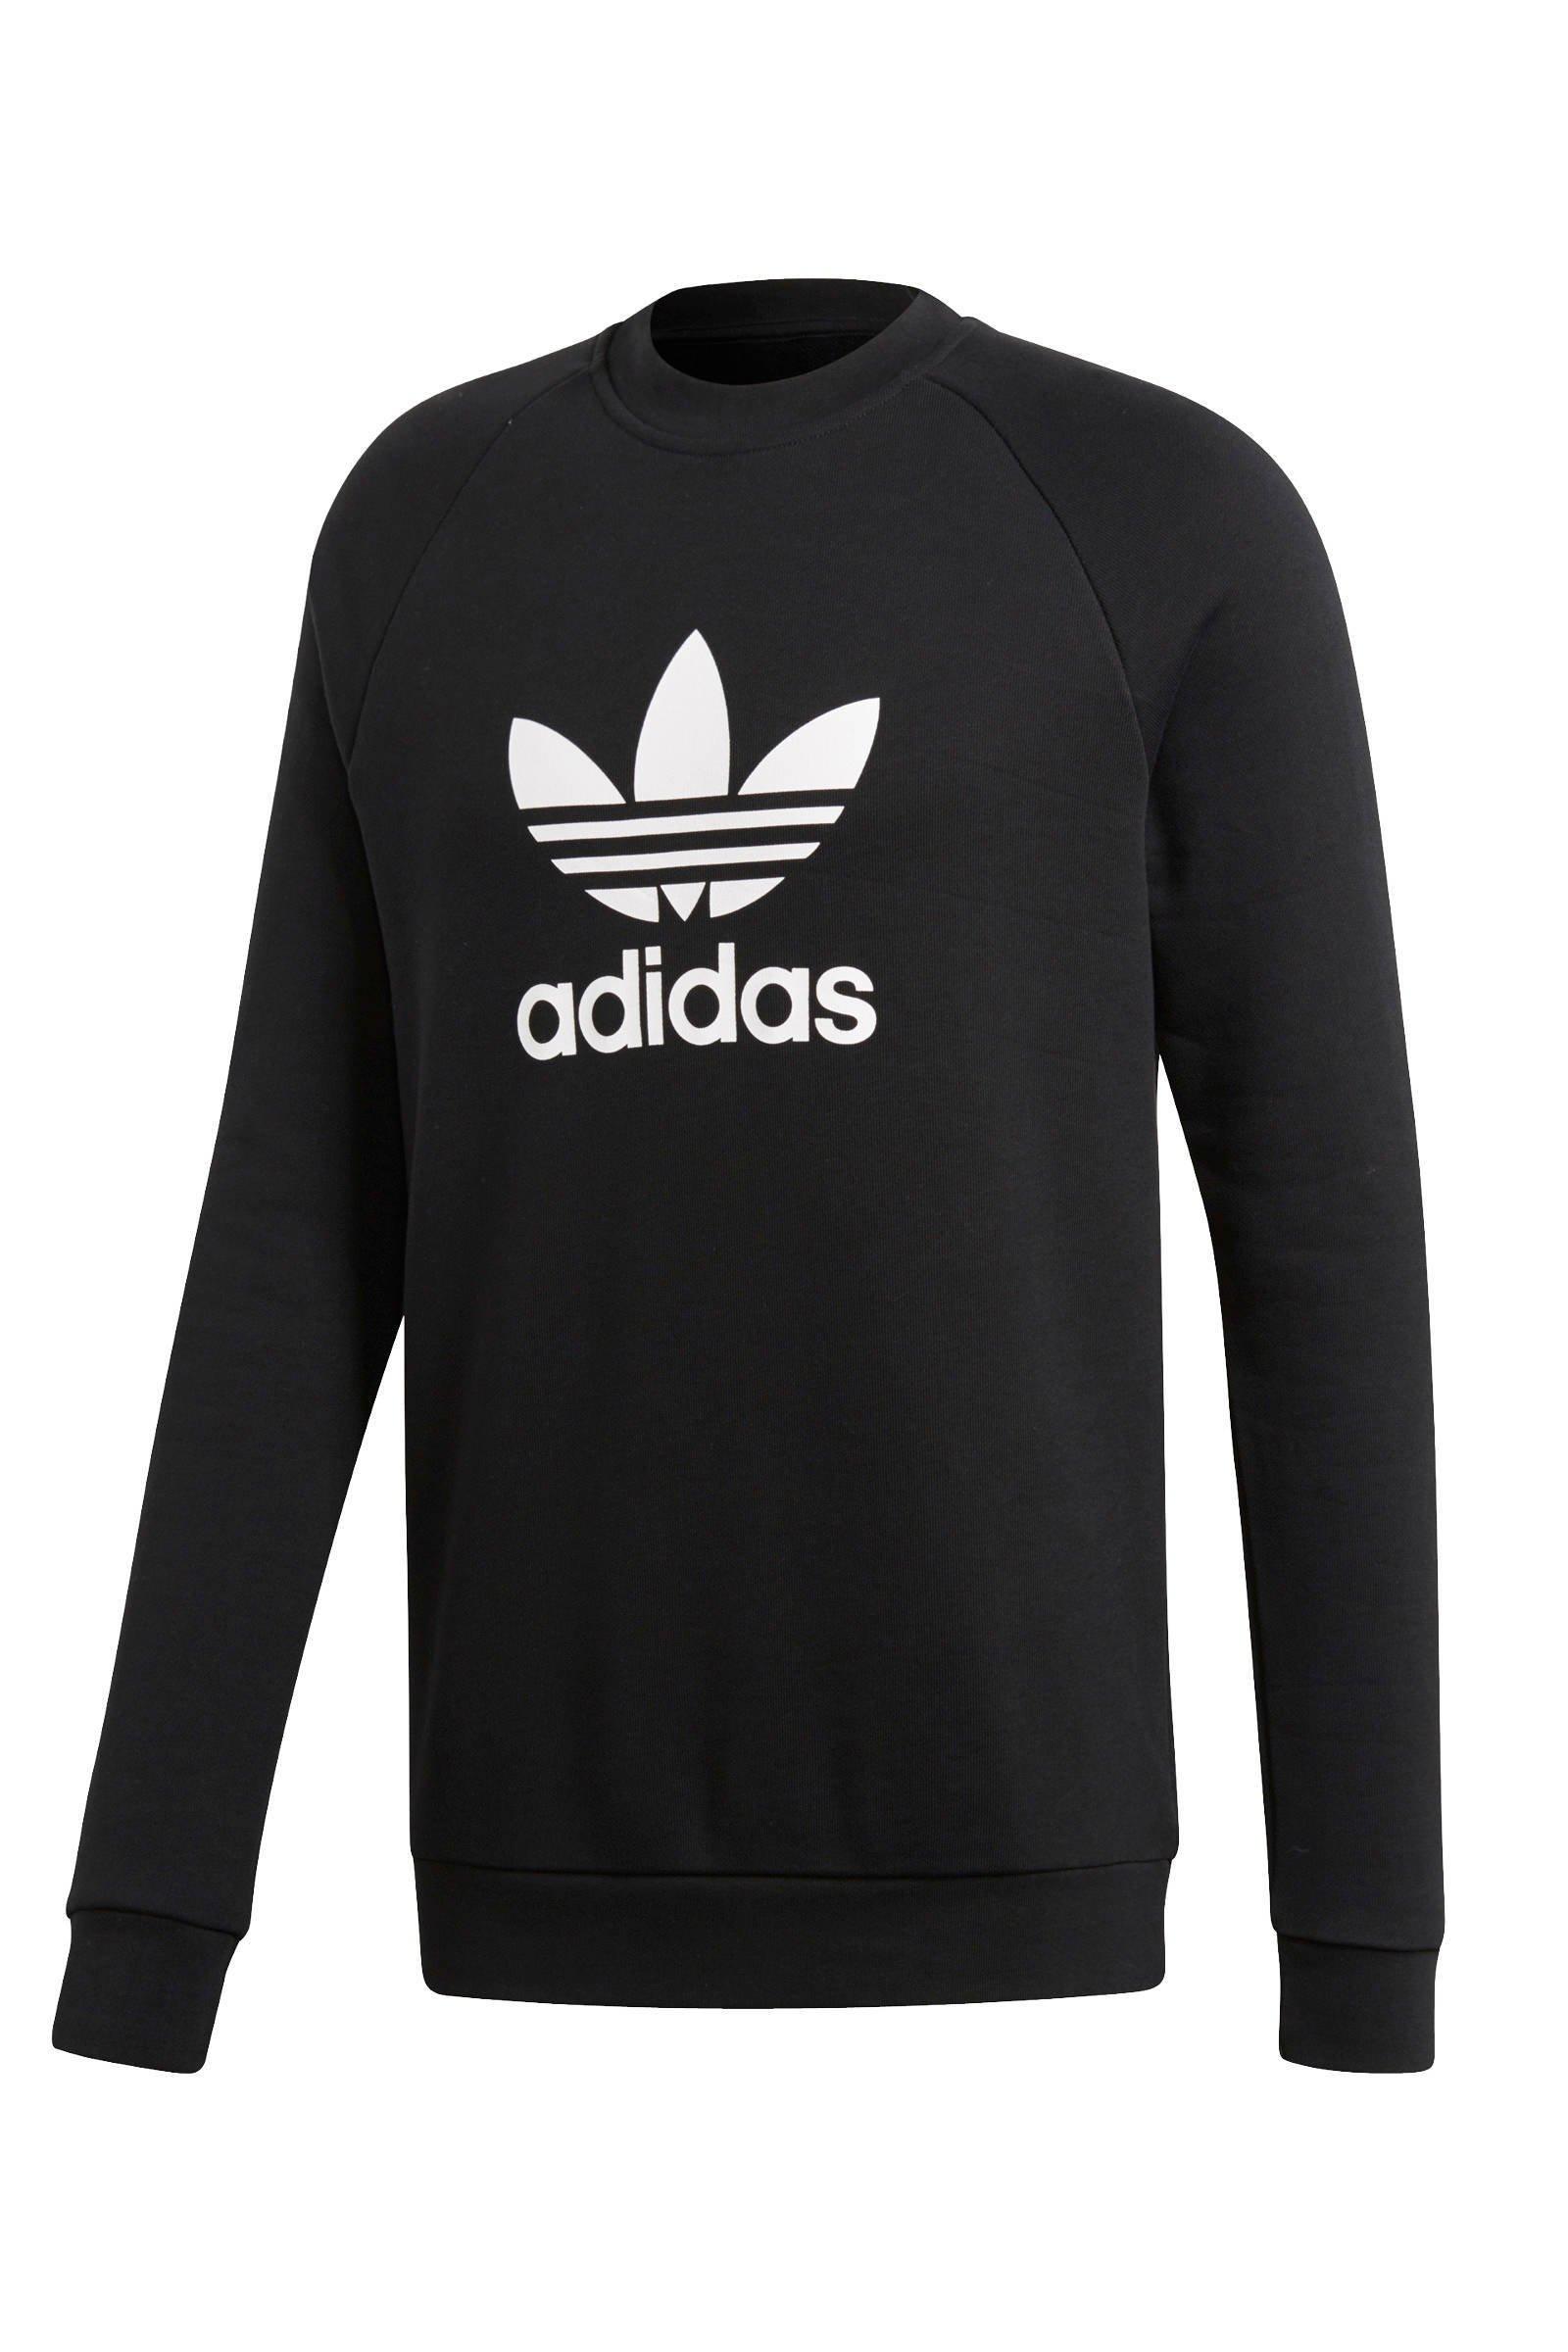 Sweater Wehkamp Wehkamp Adidas Adidas Originals Sweater Originals Adidas wHqOxUY7x